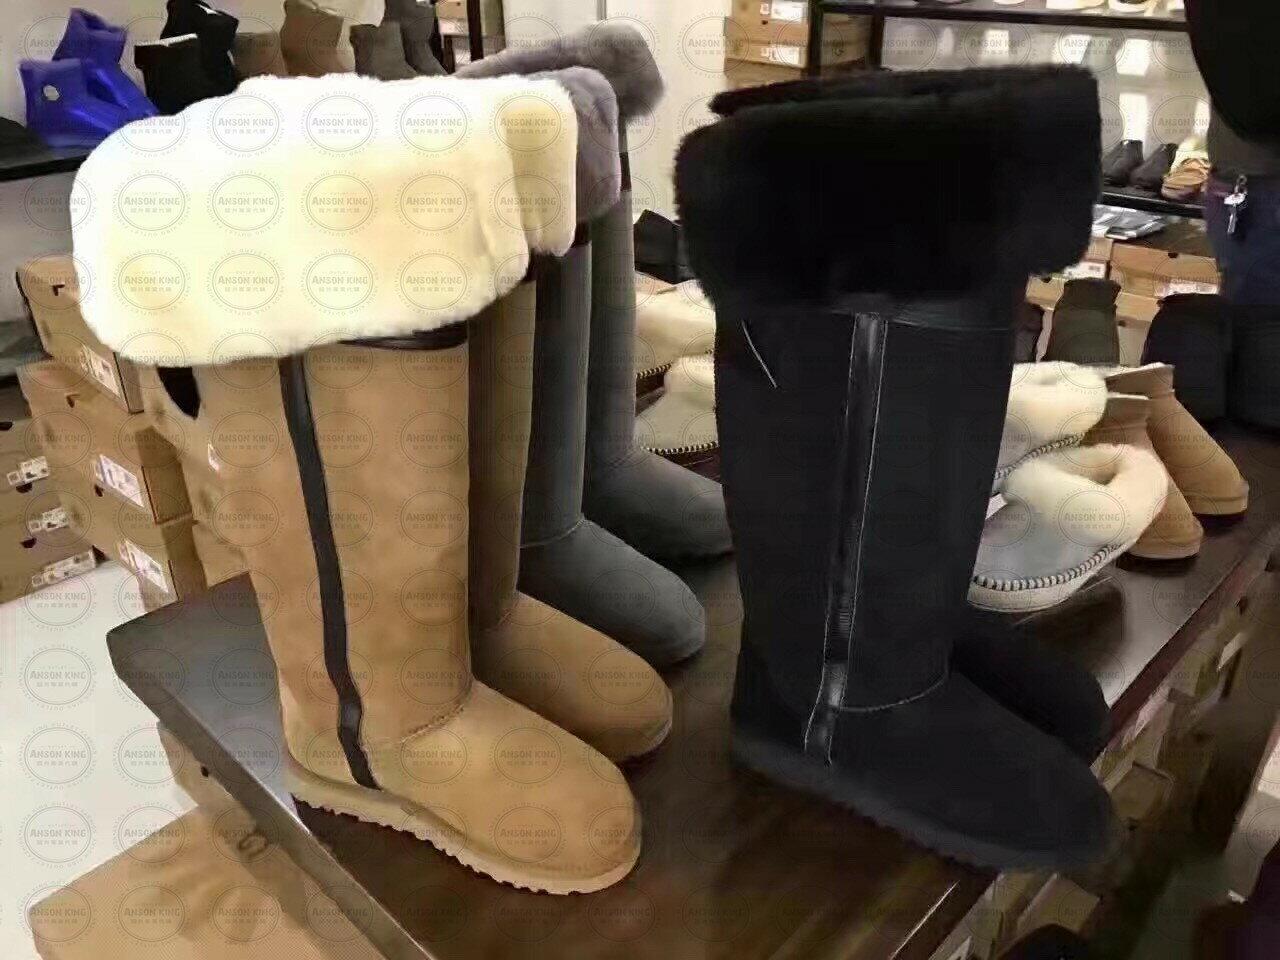 OUTLET正品代購 澳洲 UGG 千頌伊同款過膝羊皮毛雪靴 保暖 真皮羊皮毛 雪靴 短靴 灰色 3